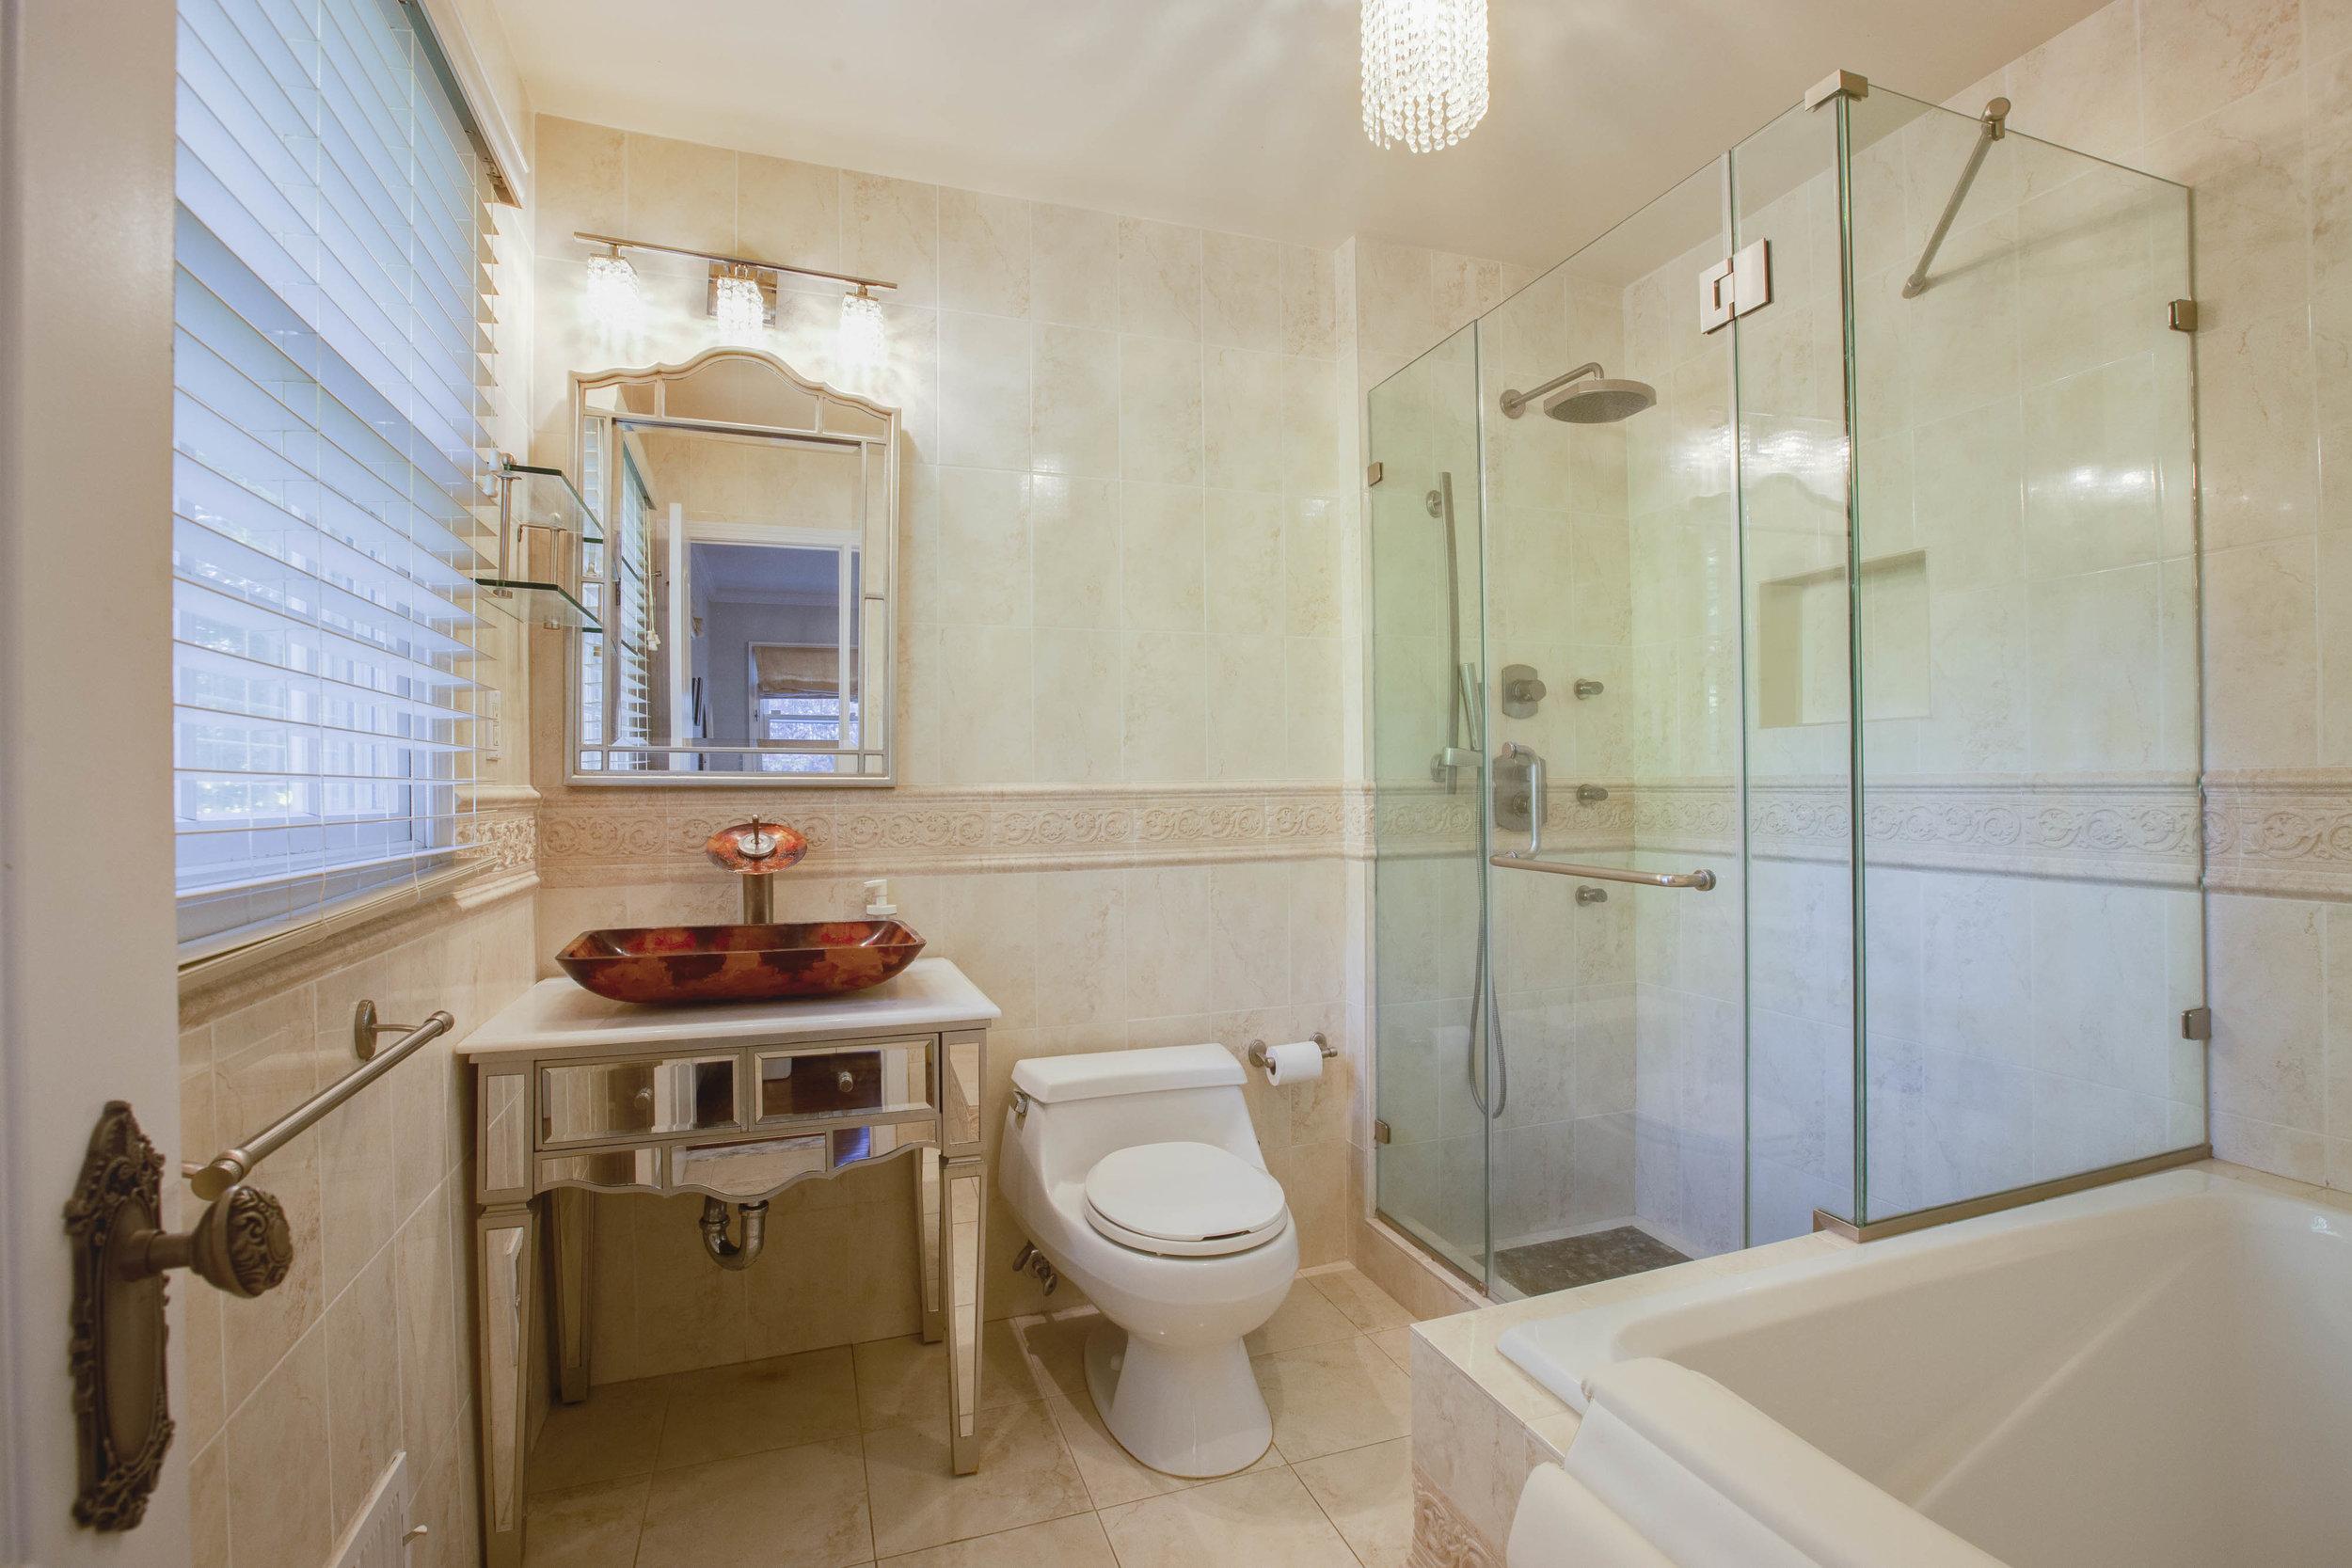 012_Bathroom .jpg